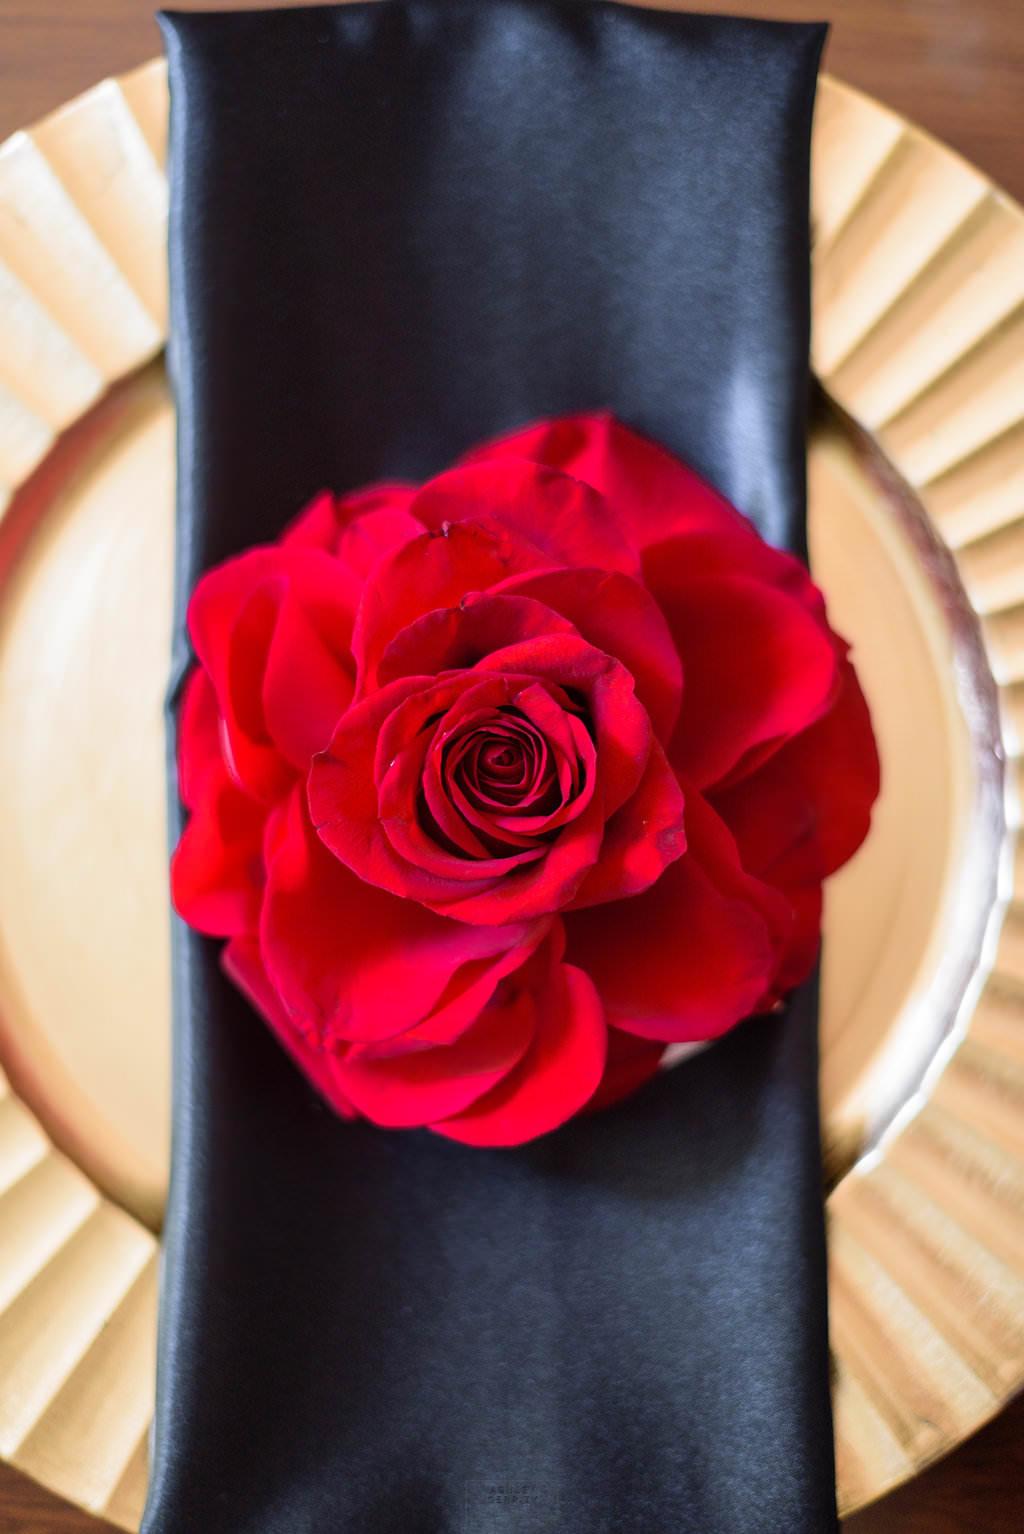 30 Giant Red Rose Blossom Place Card Spanish Rose Wedding.jpg